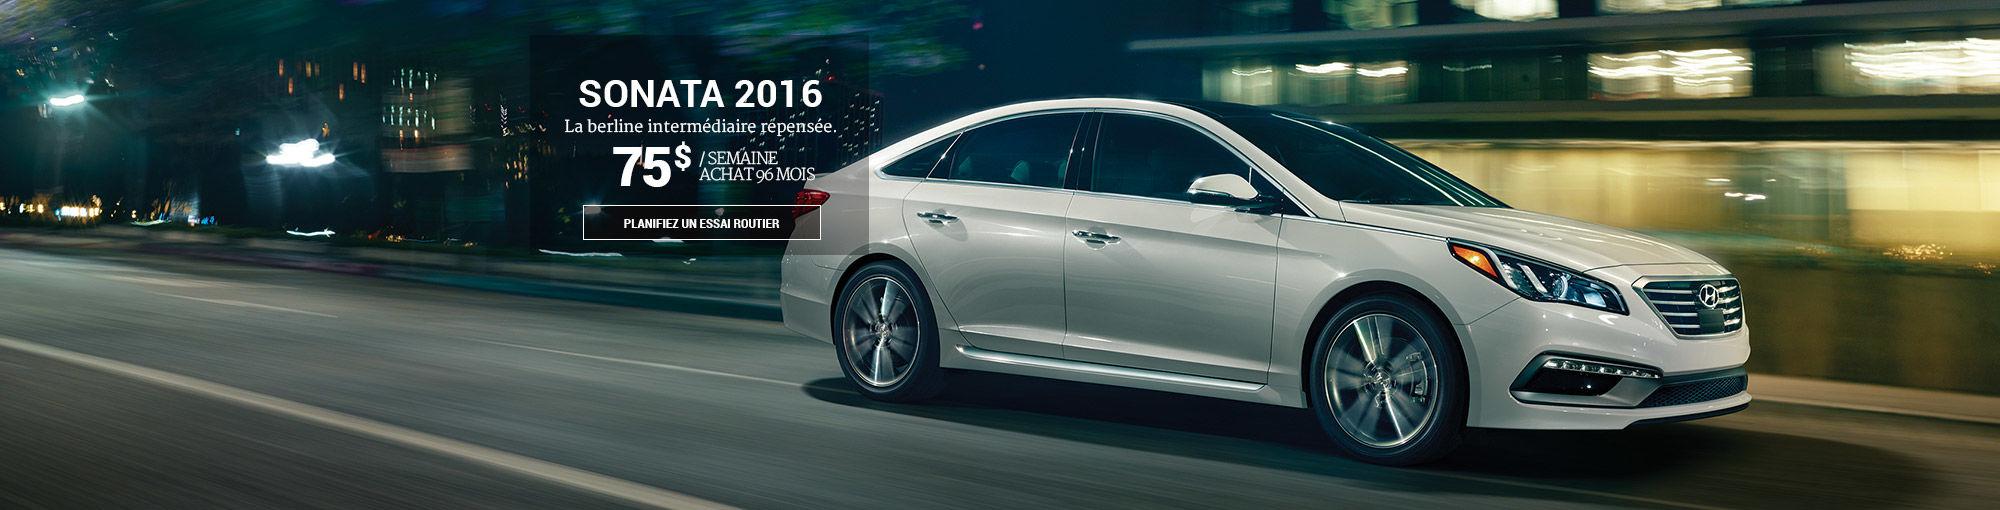 Sonata 2016 - août 2016 - HTR